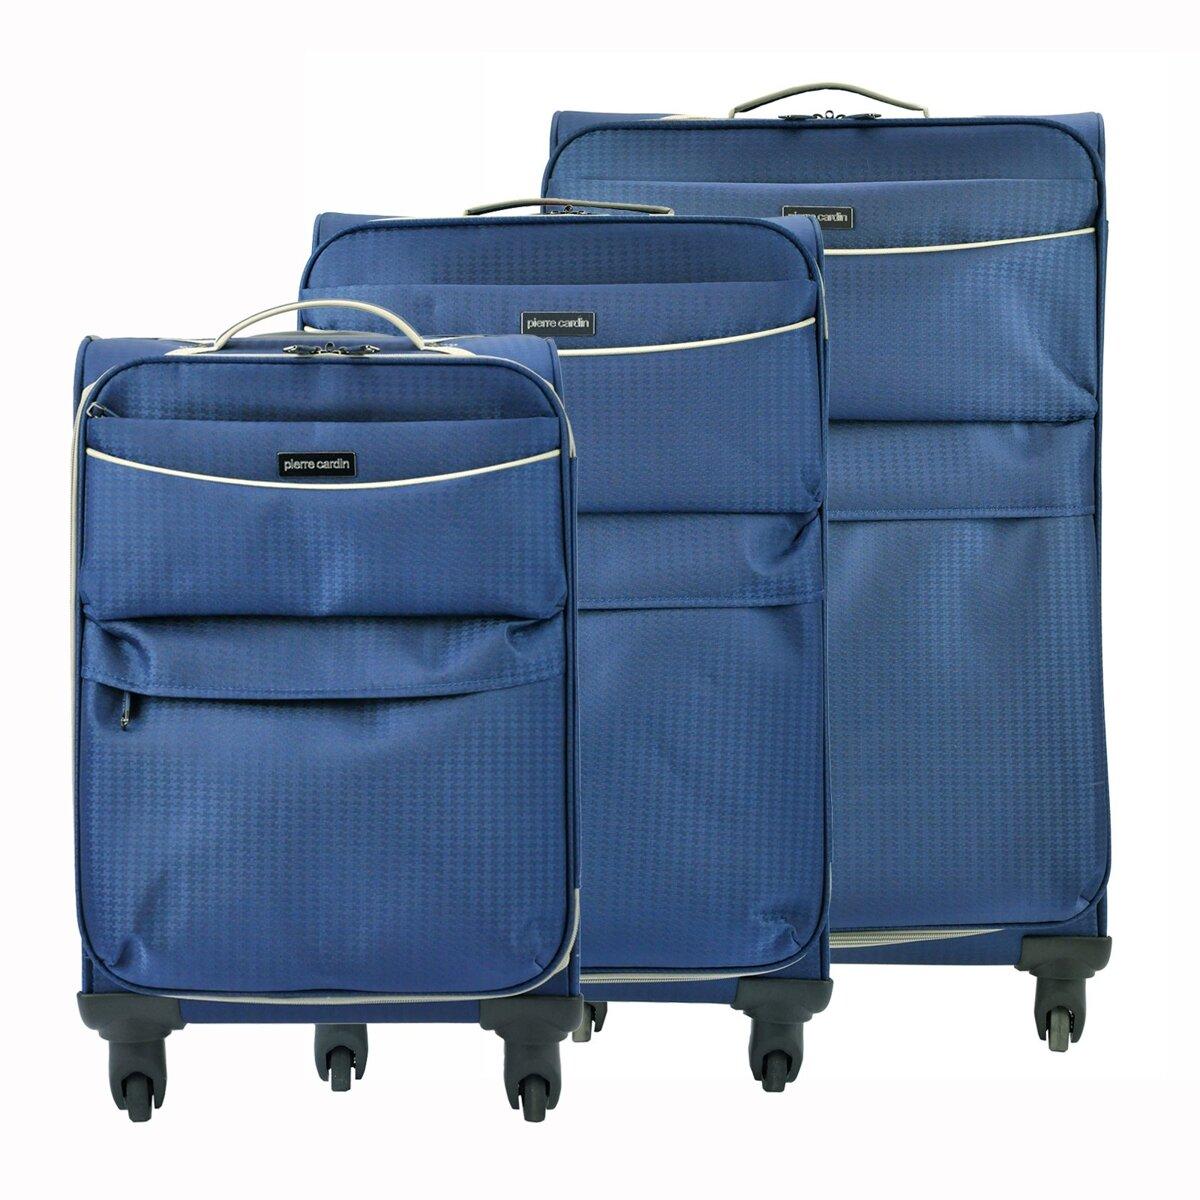 6065b0d70face Sada cestovných kufrov Pierre Cardin DAVID01 SH-6908 x3 Z